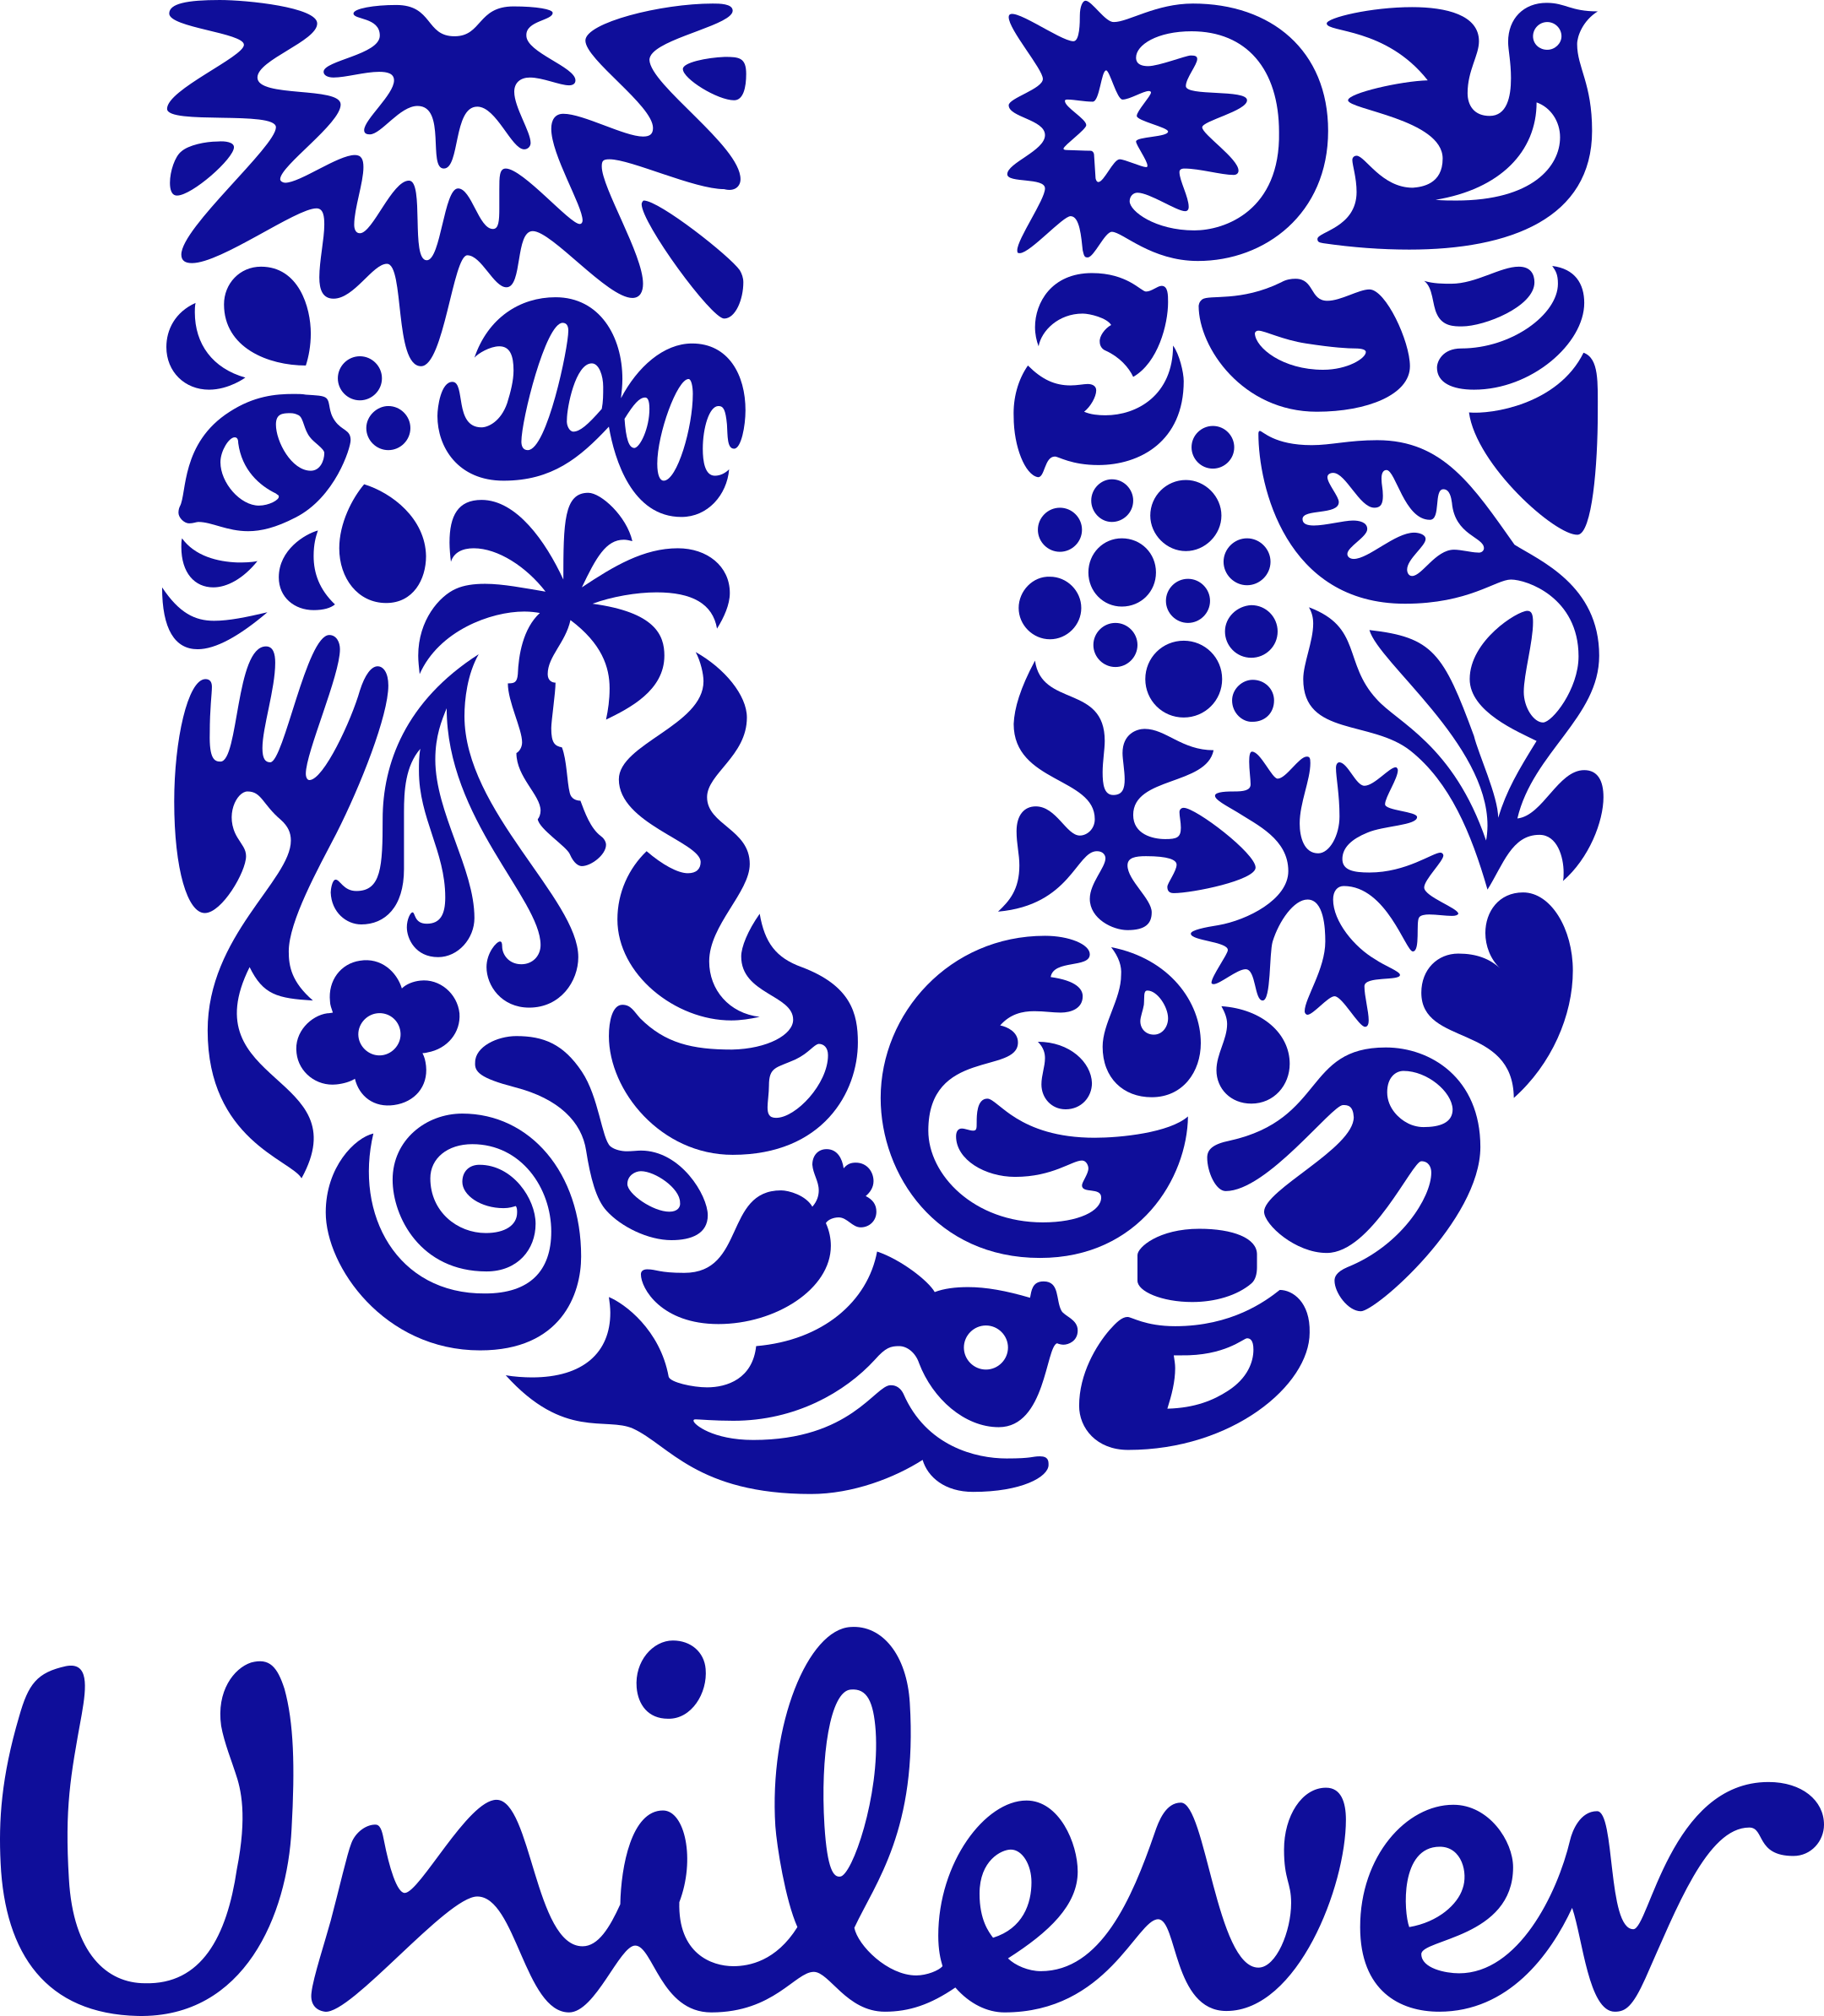 unilever logo 1 1 - Unilever Logo